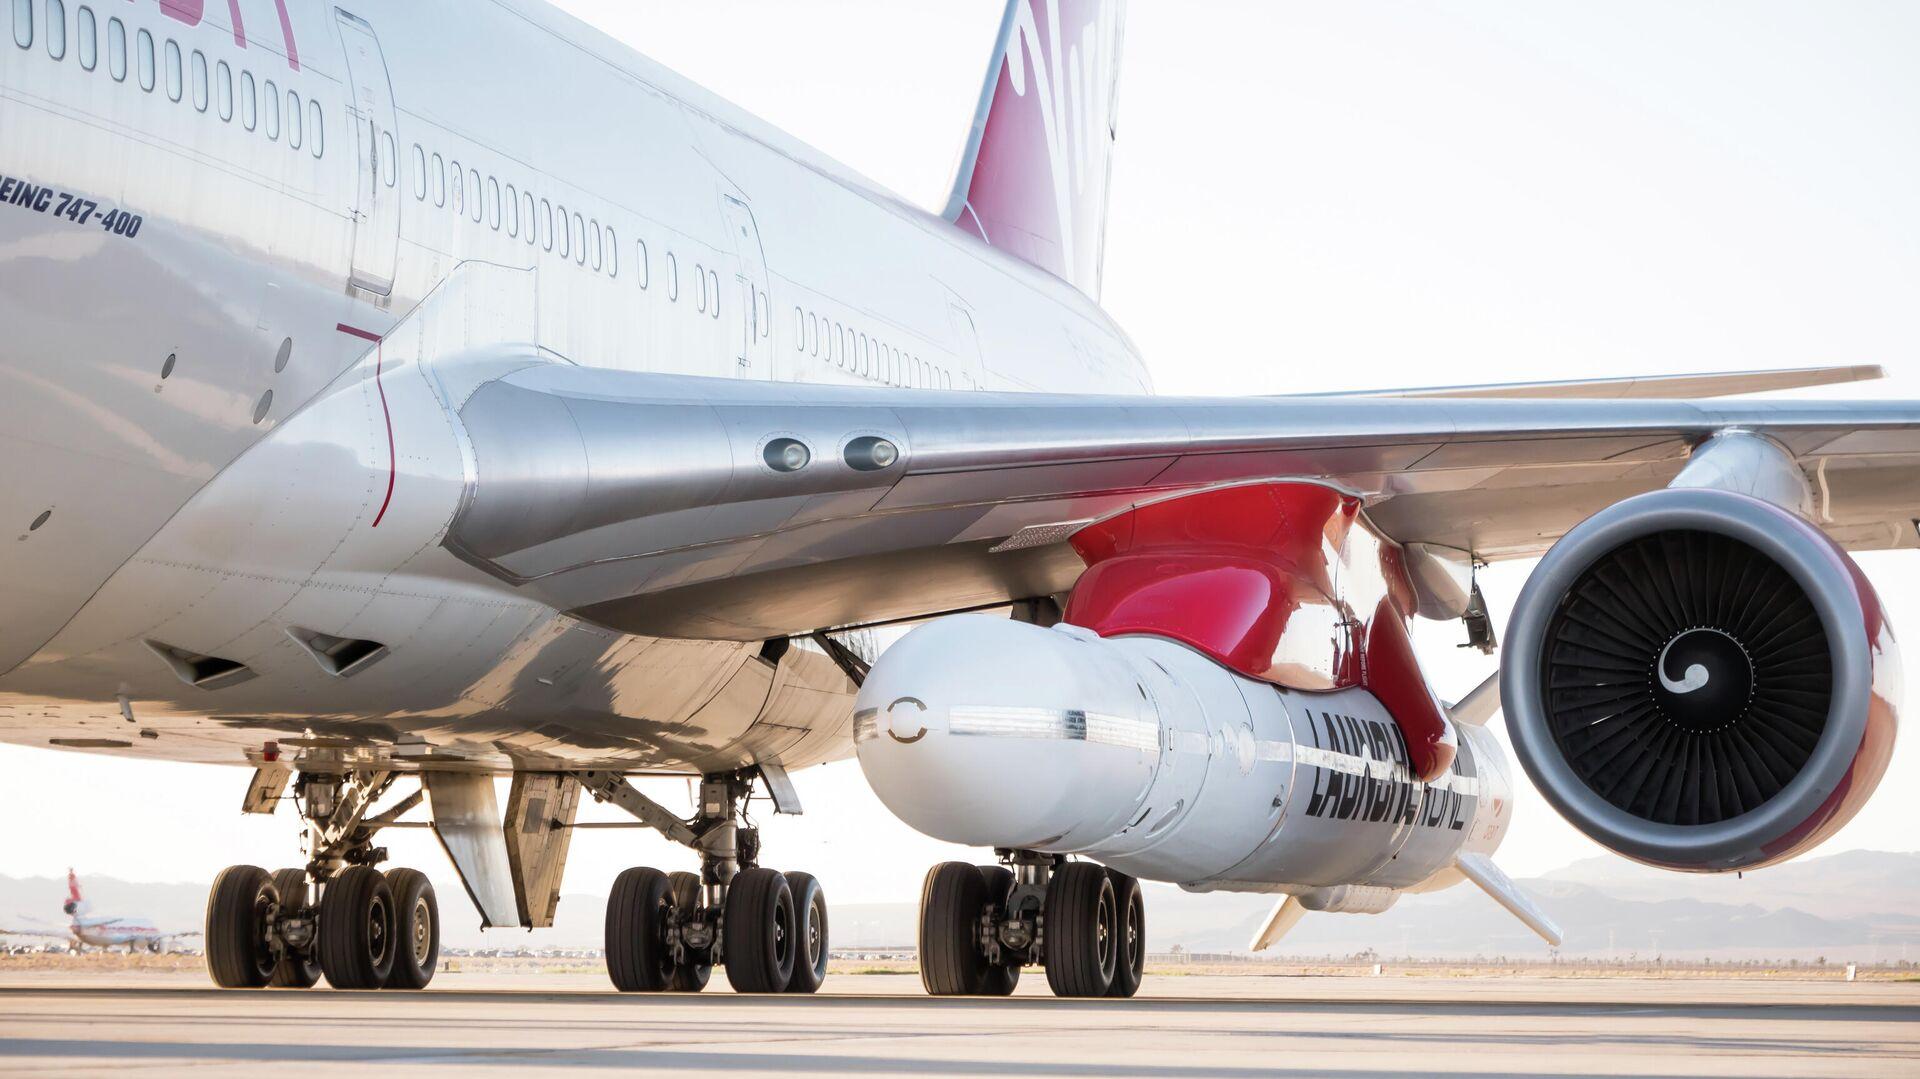 Cohete L1 suspendido bajo el ala del Boeing 747 de Virgin Orbit - Sputnik Mundo, 1920, 01.07.2021